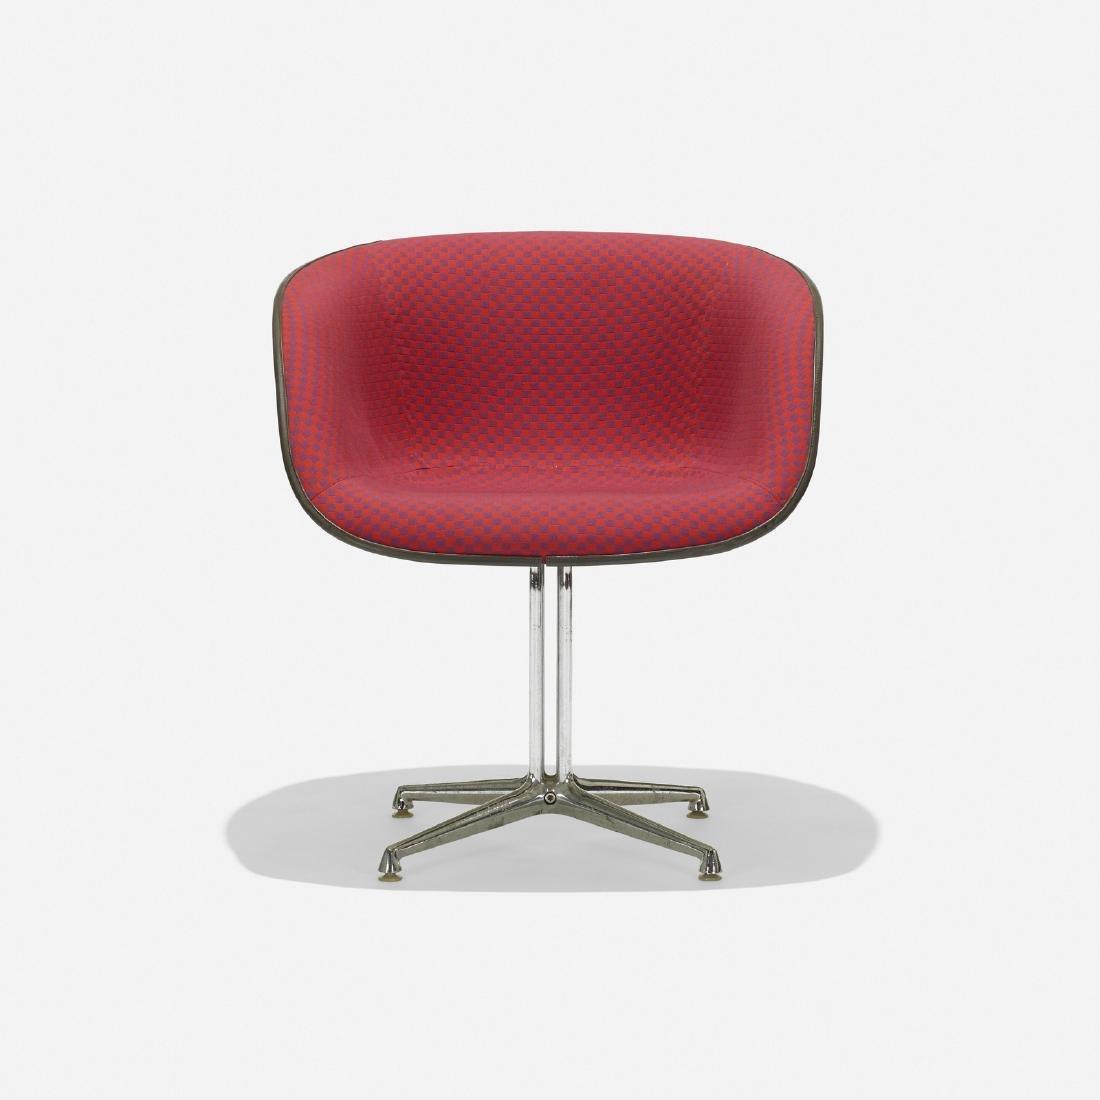 Charles and Ray Eames, La Fonda armchair